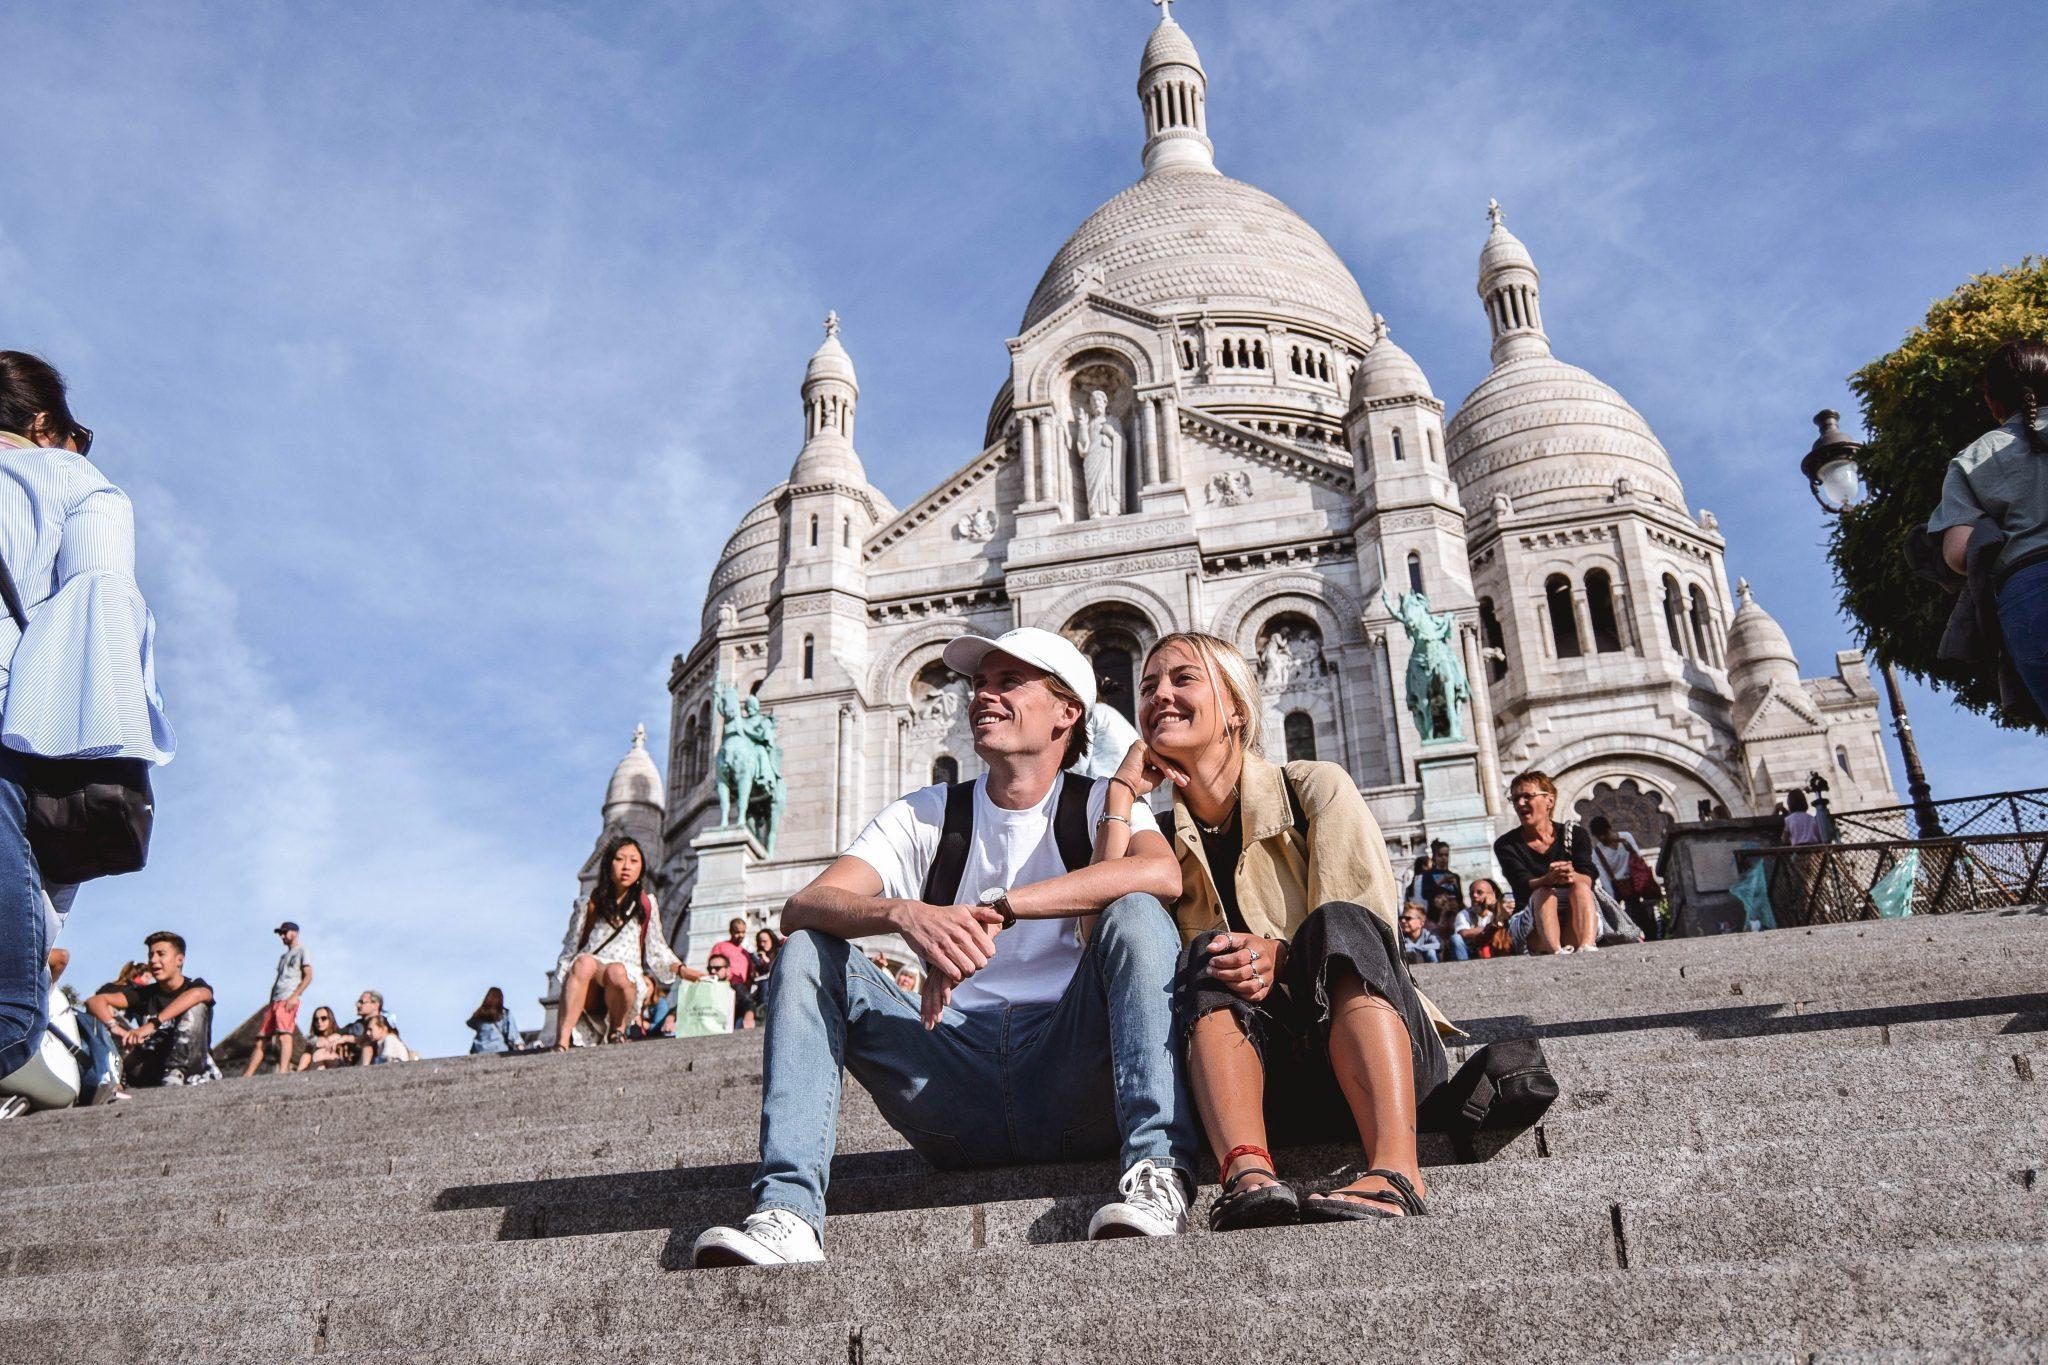 Wanderers & Warriors - Charlie & Lauren UK Travel Couple - Two Days In Paris Itinerary - Sacre-Coeur Paris